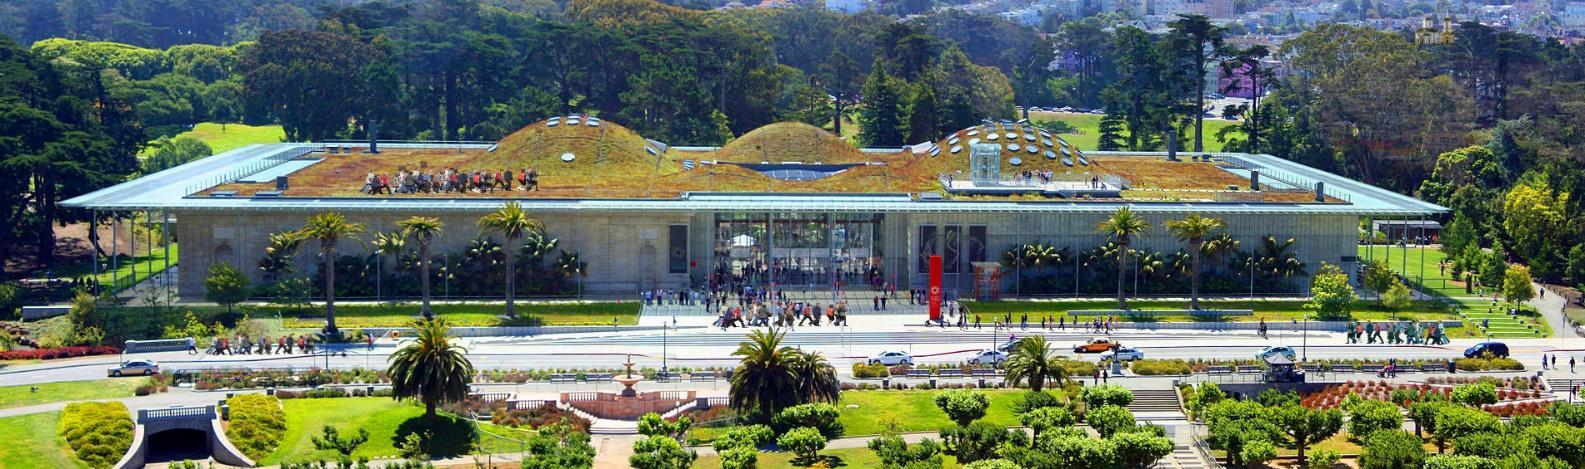 Visit California Academy